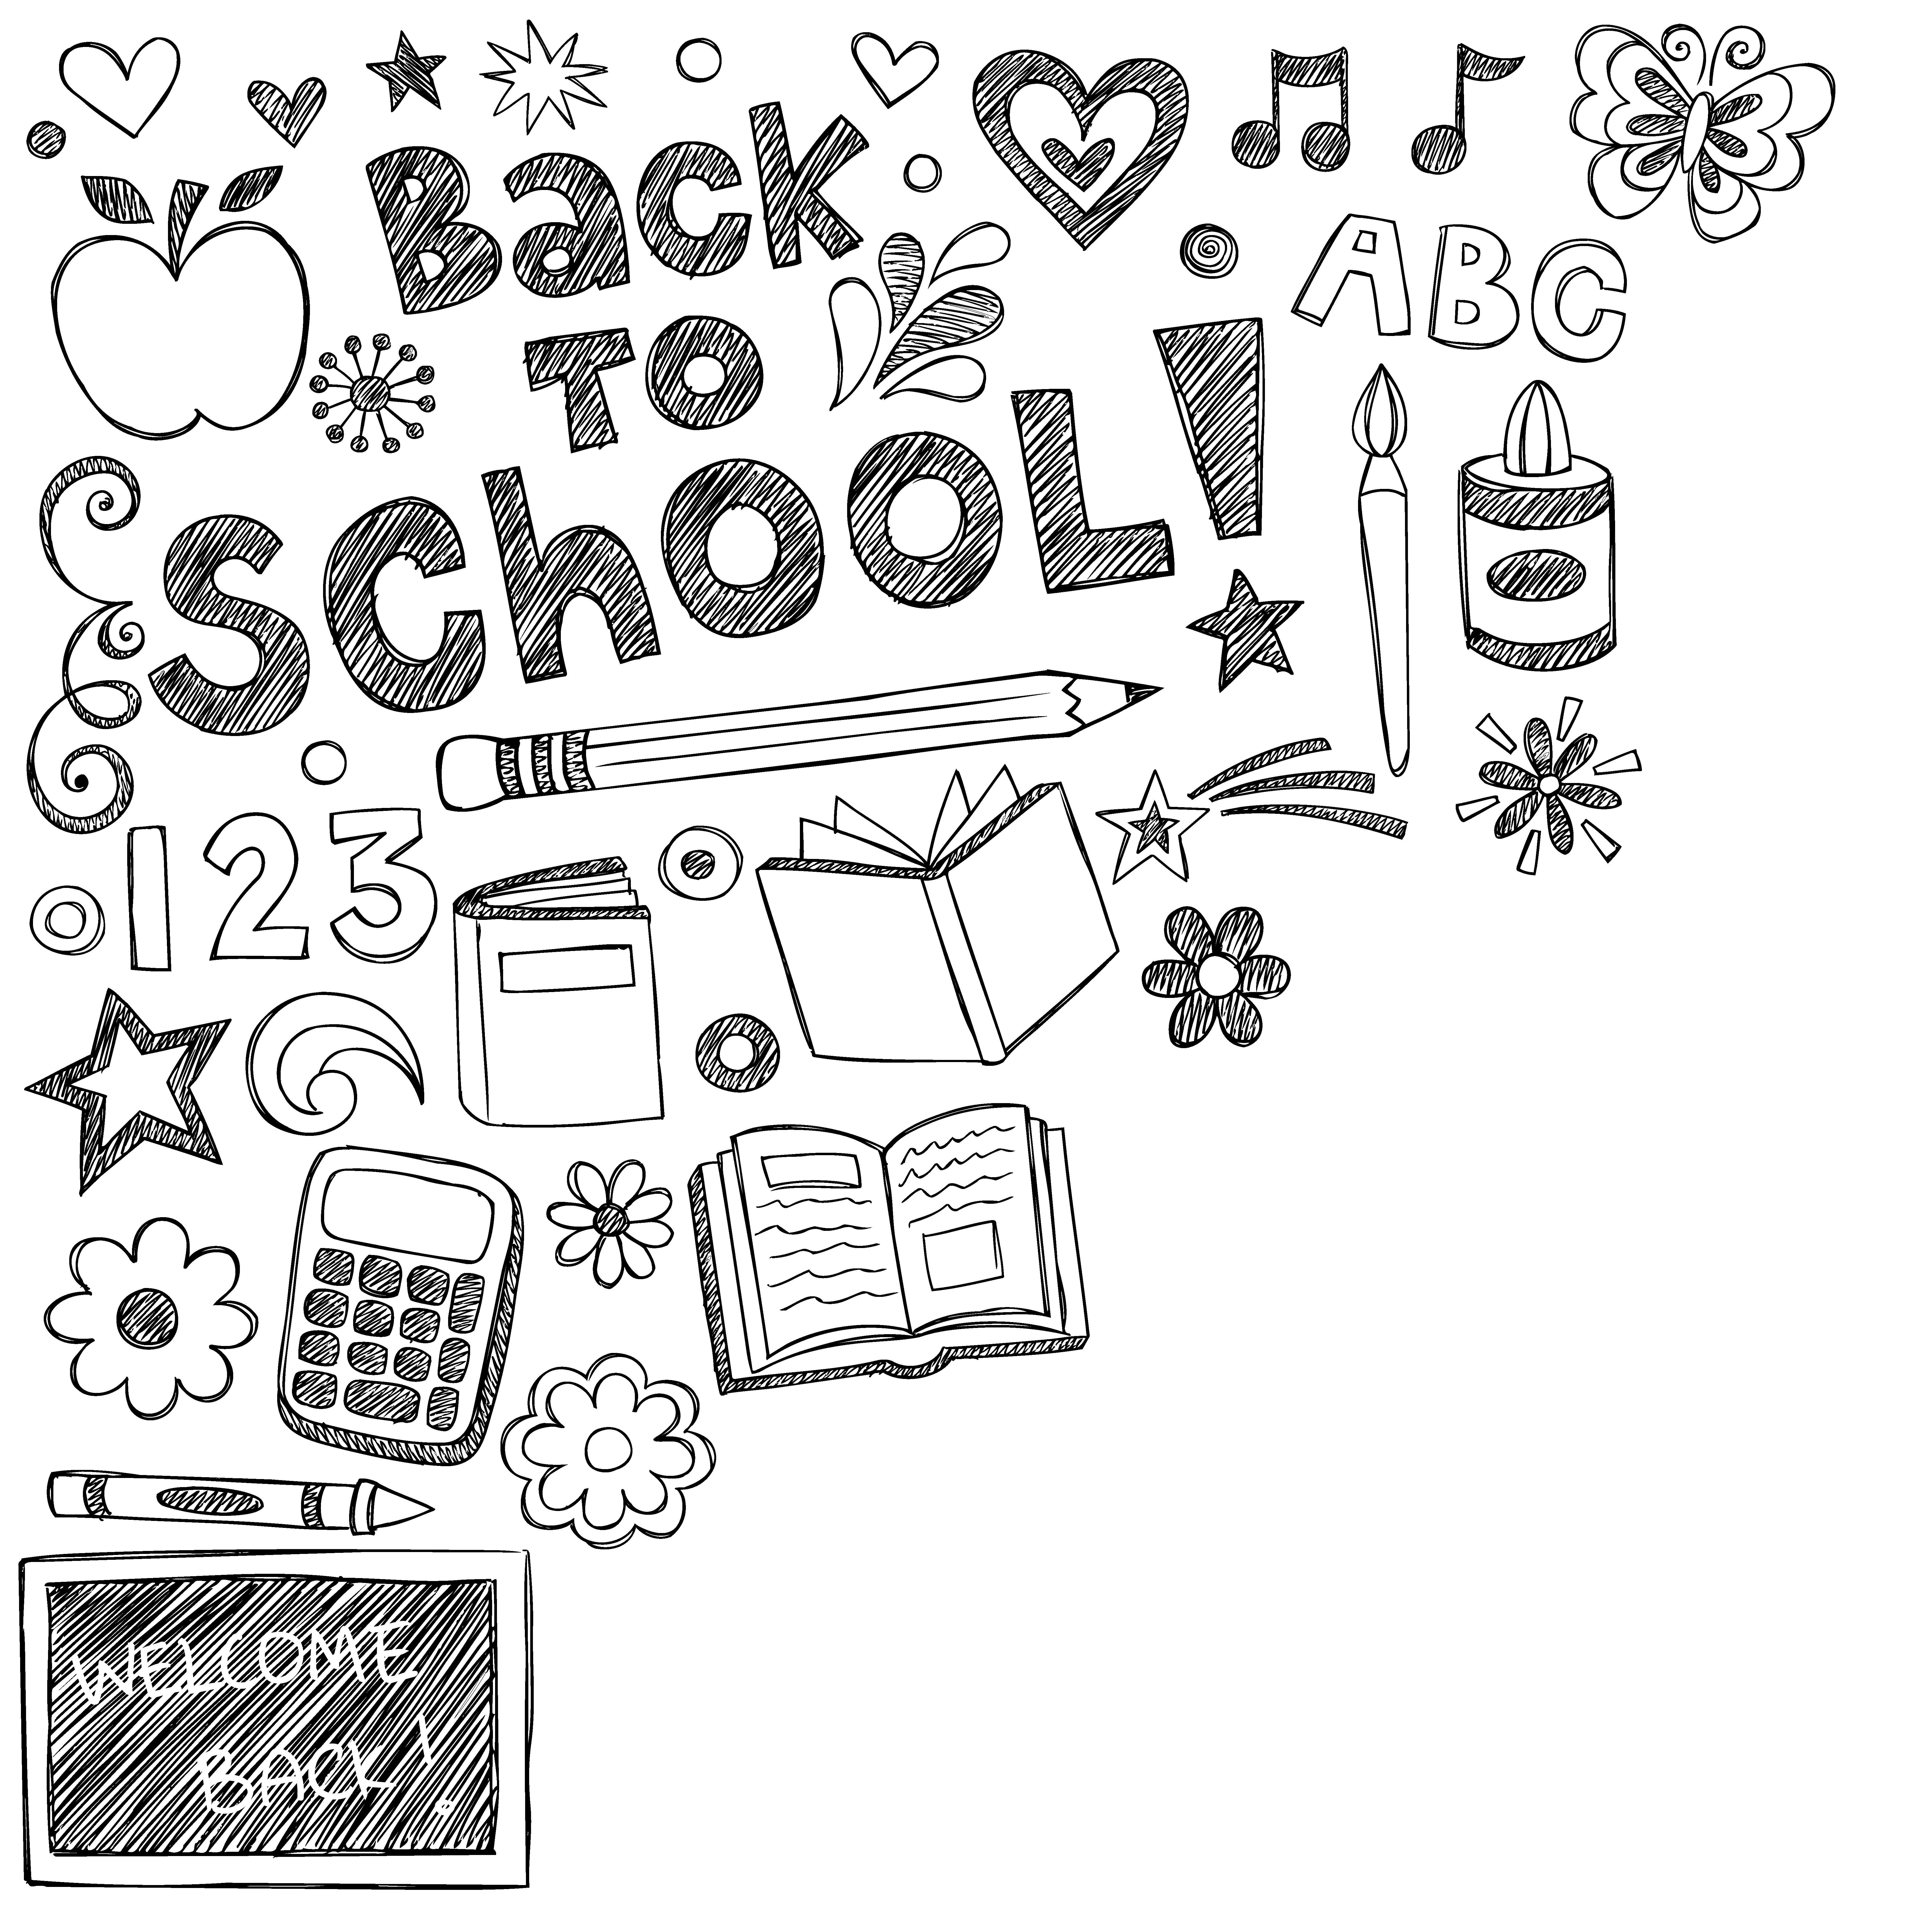 7200x7200 Best Of Back To School